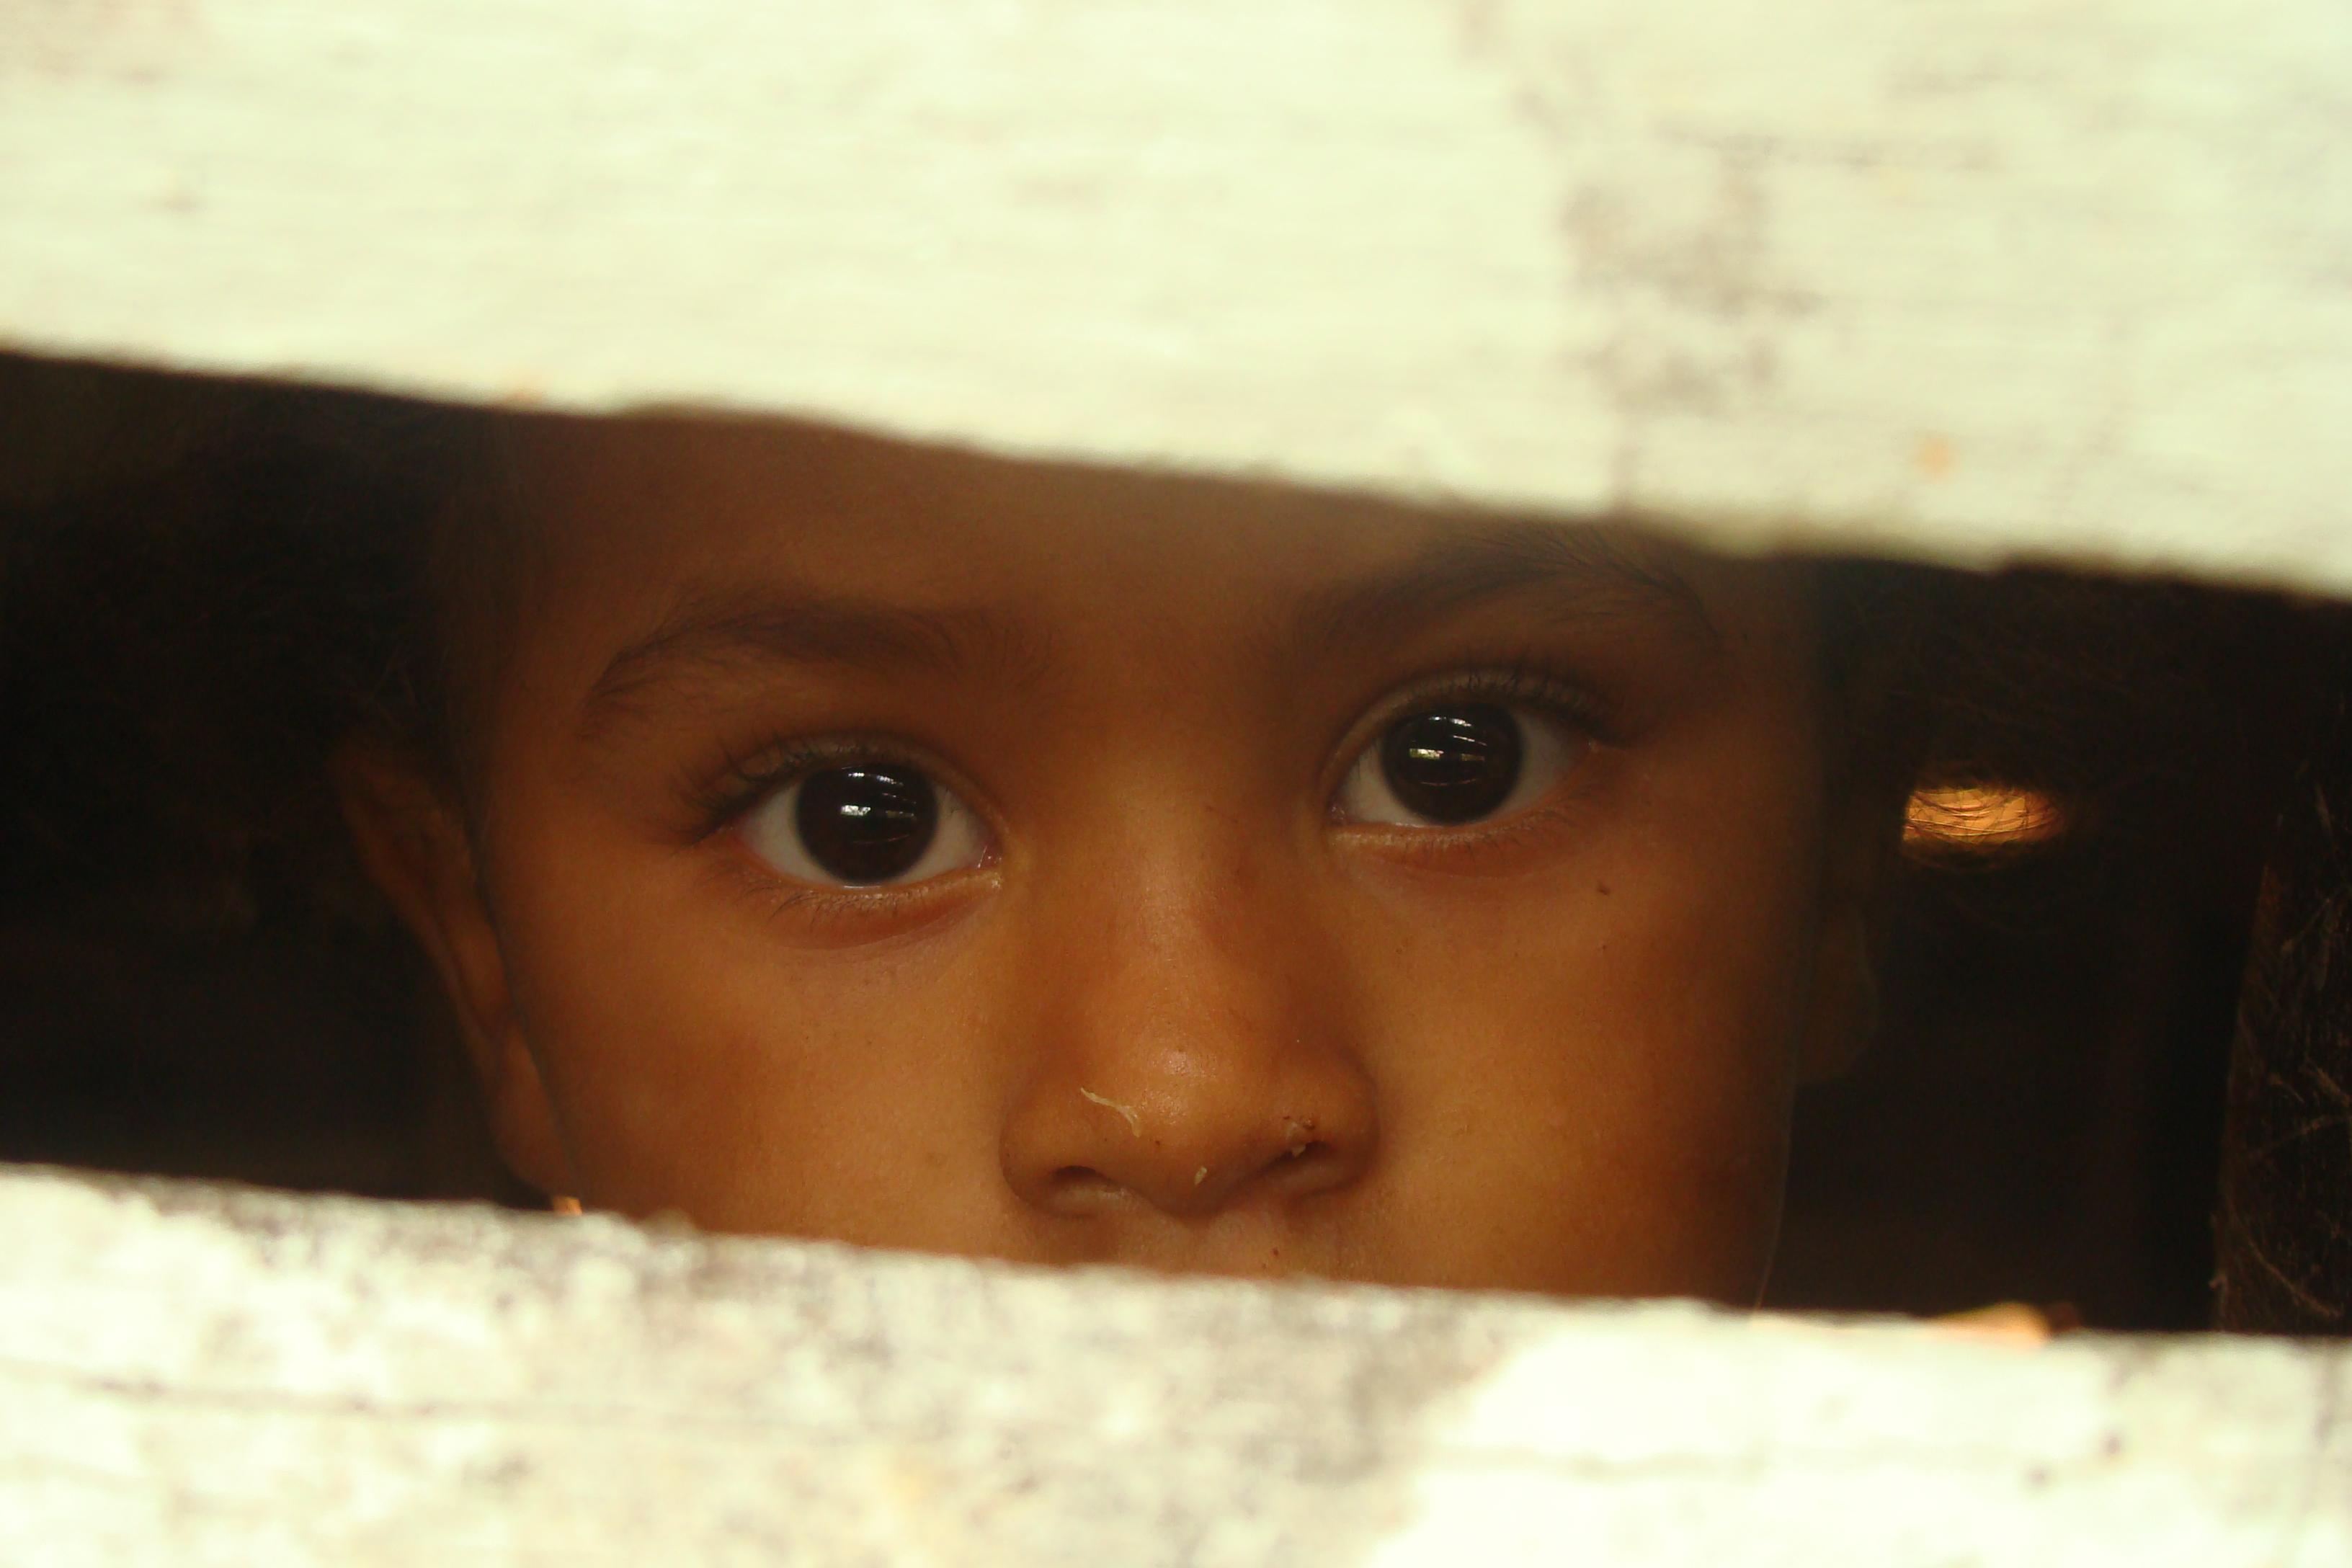 Una niña mira por la apertura de una puerta.